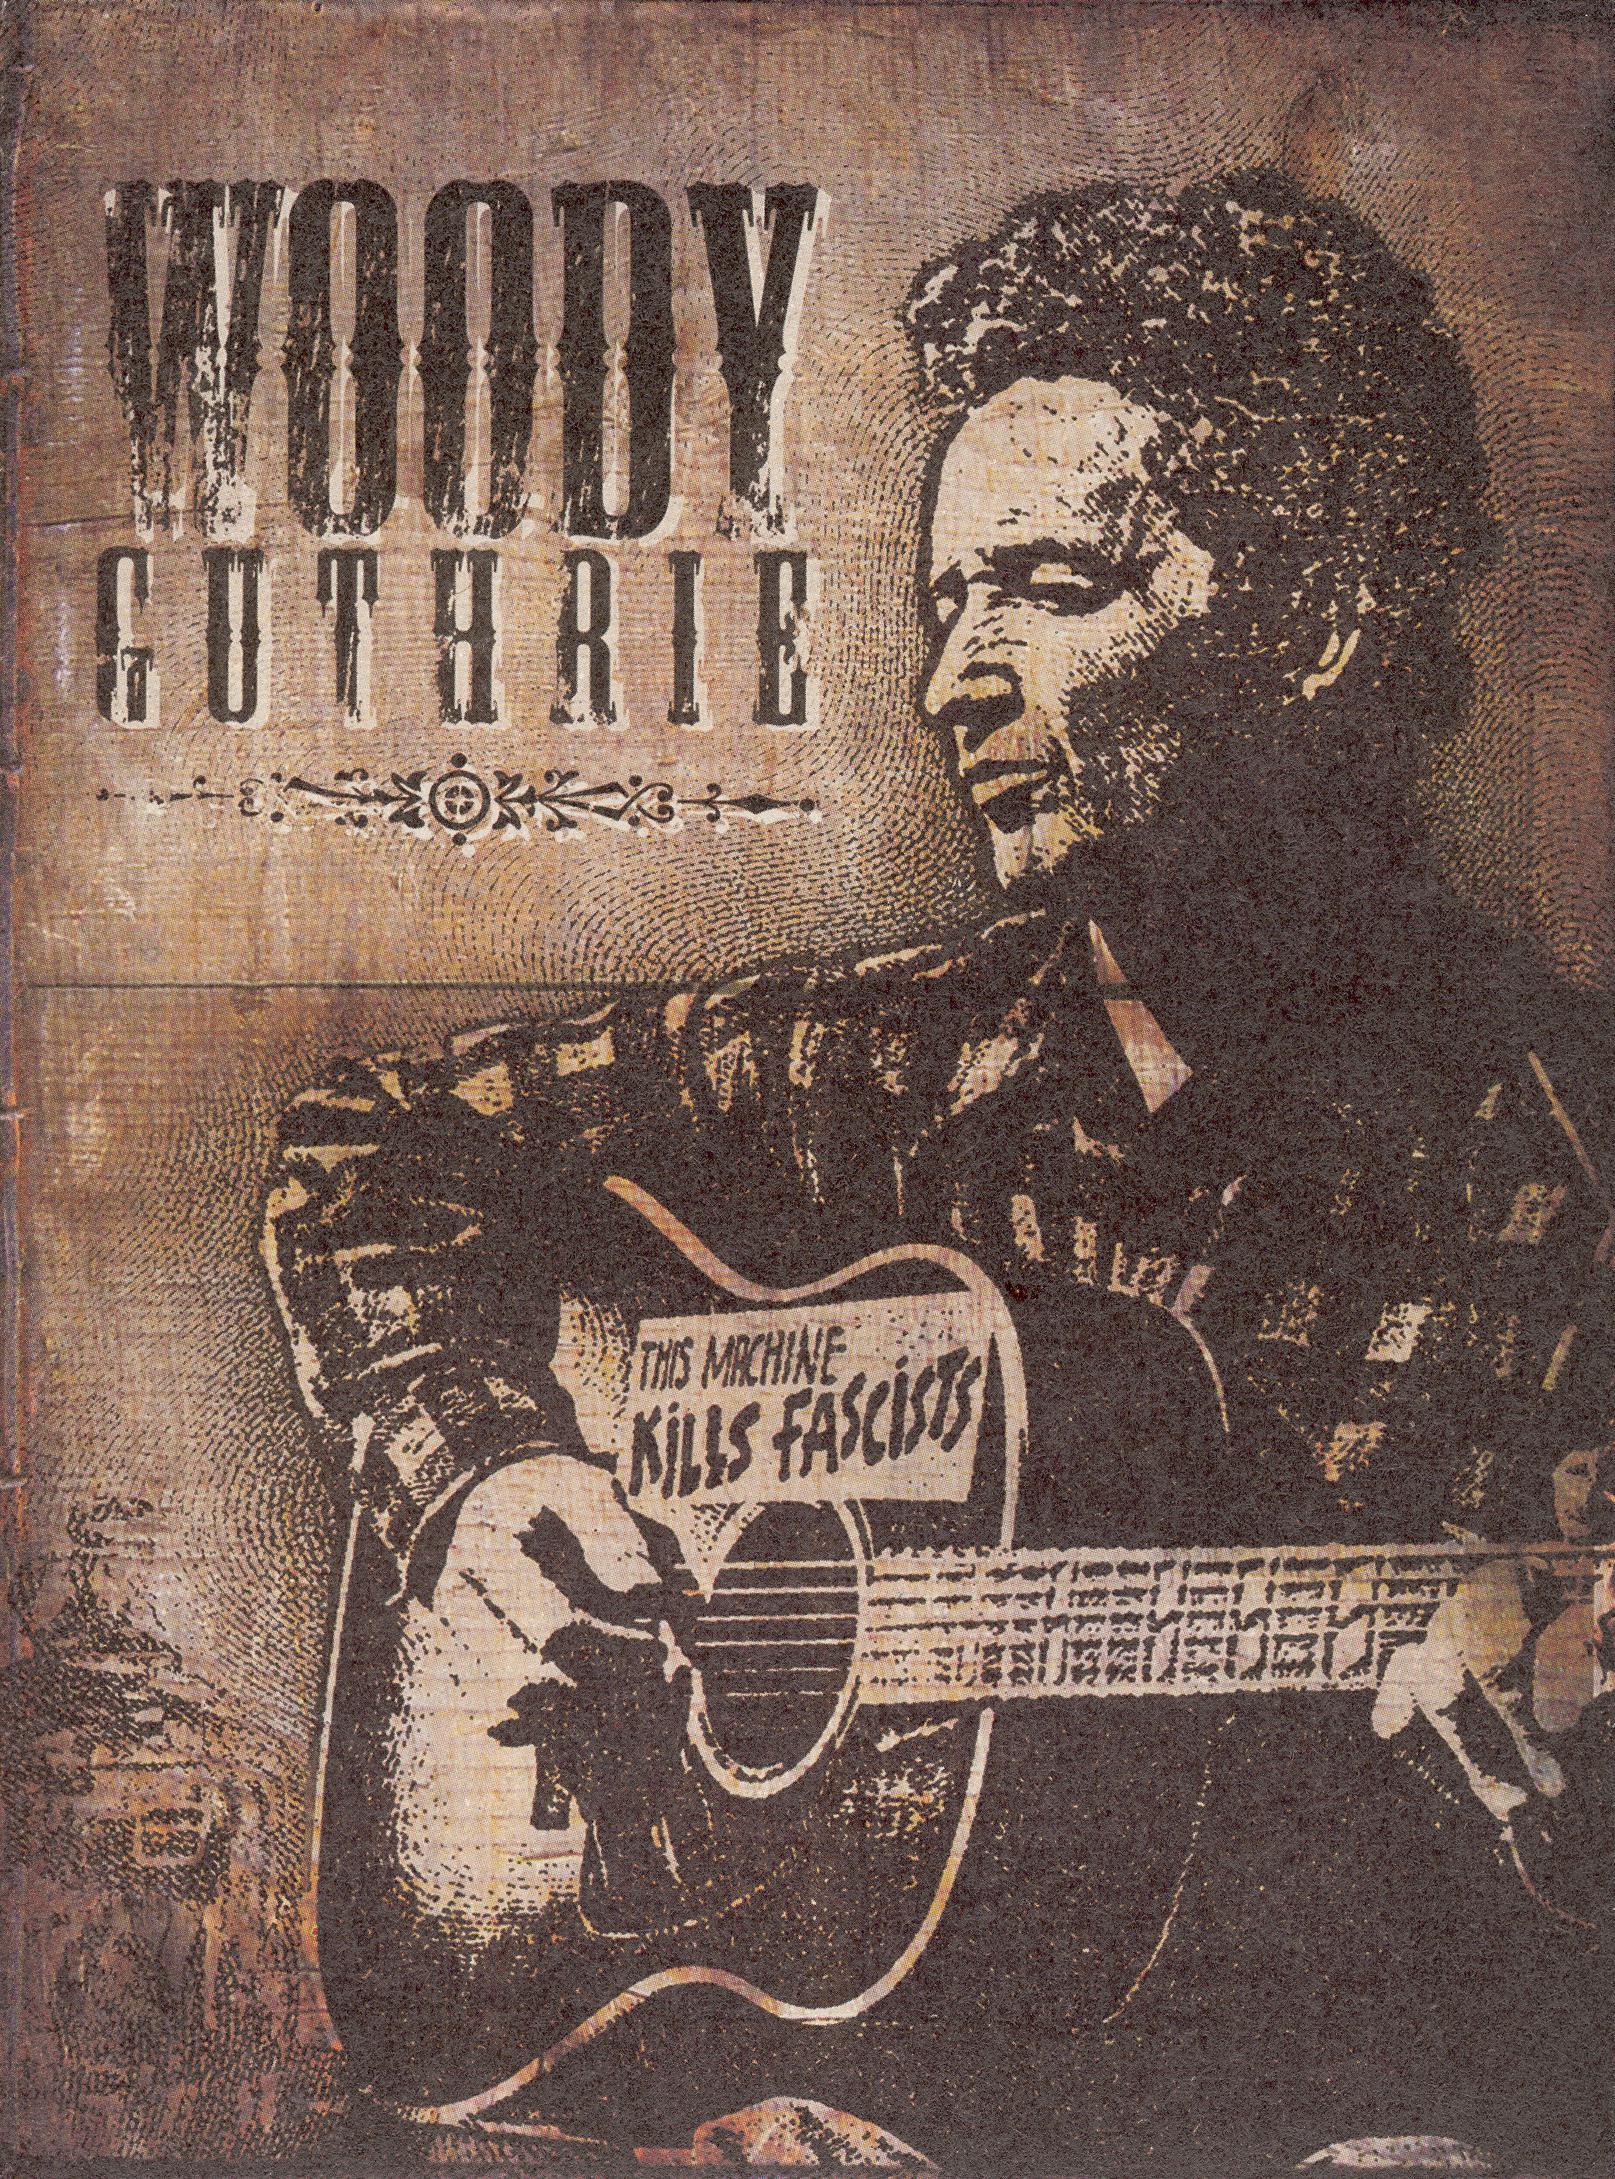 Woody Guthrie: This Machine Kills Fascists